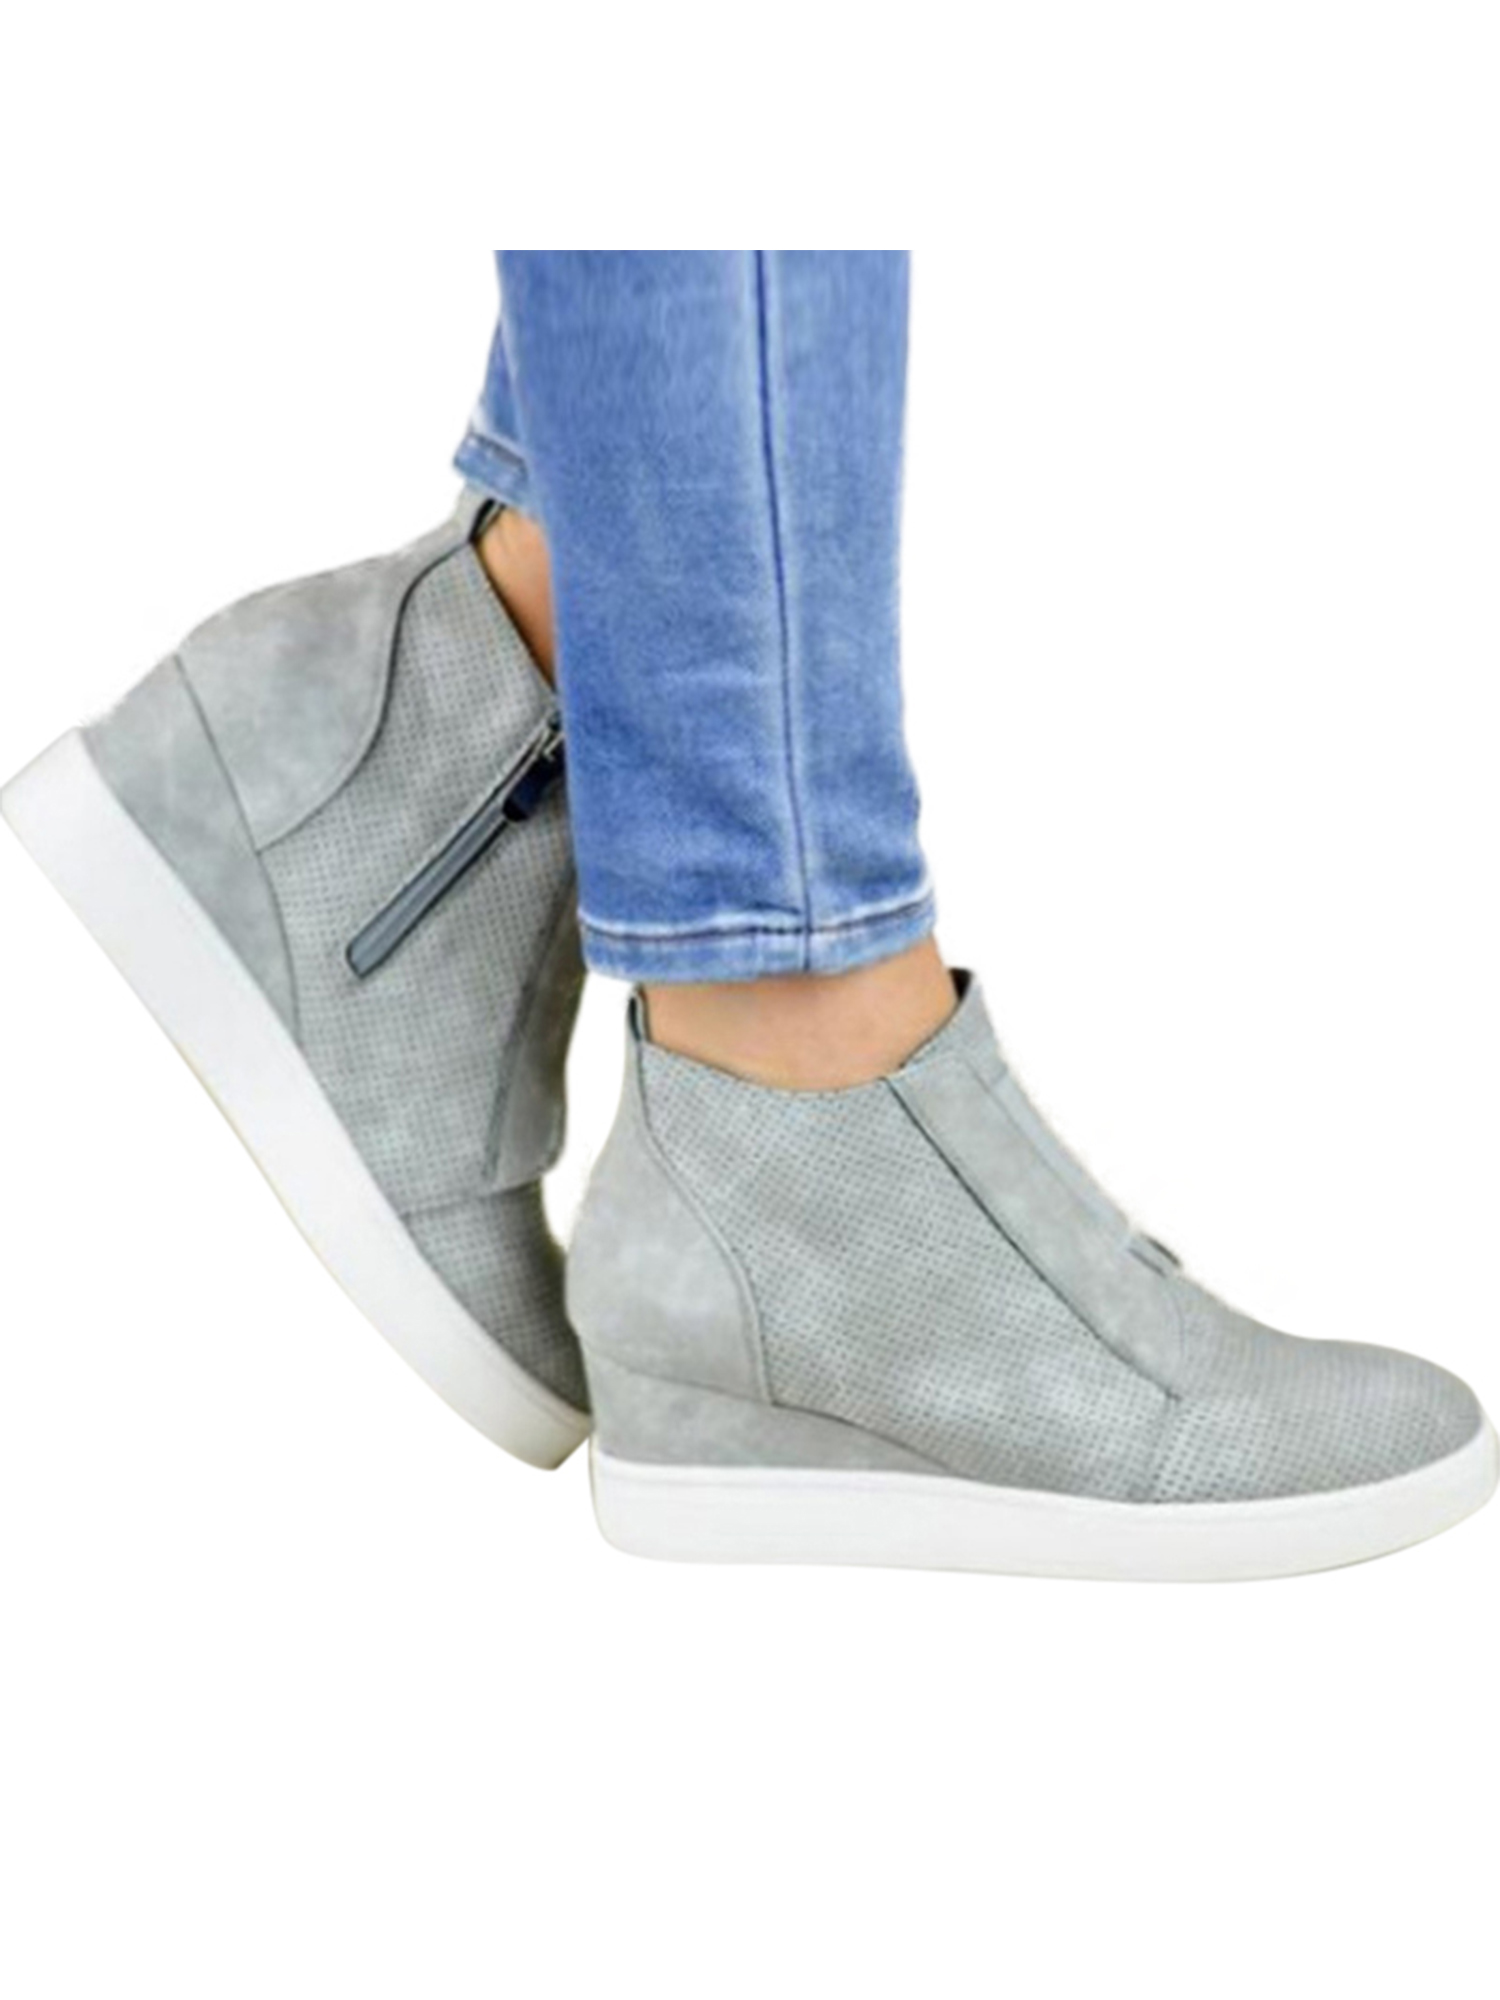 Women Zipper Low Heel Ankle Boots Wedge